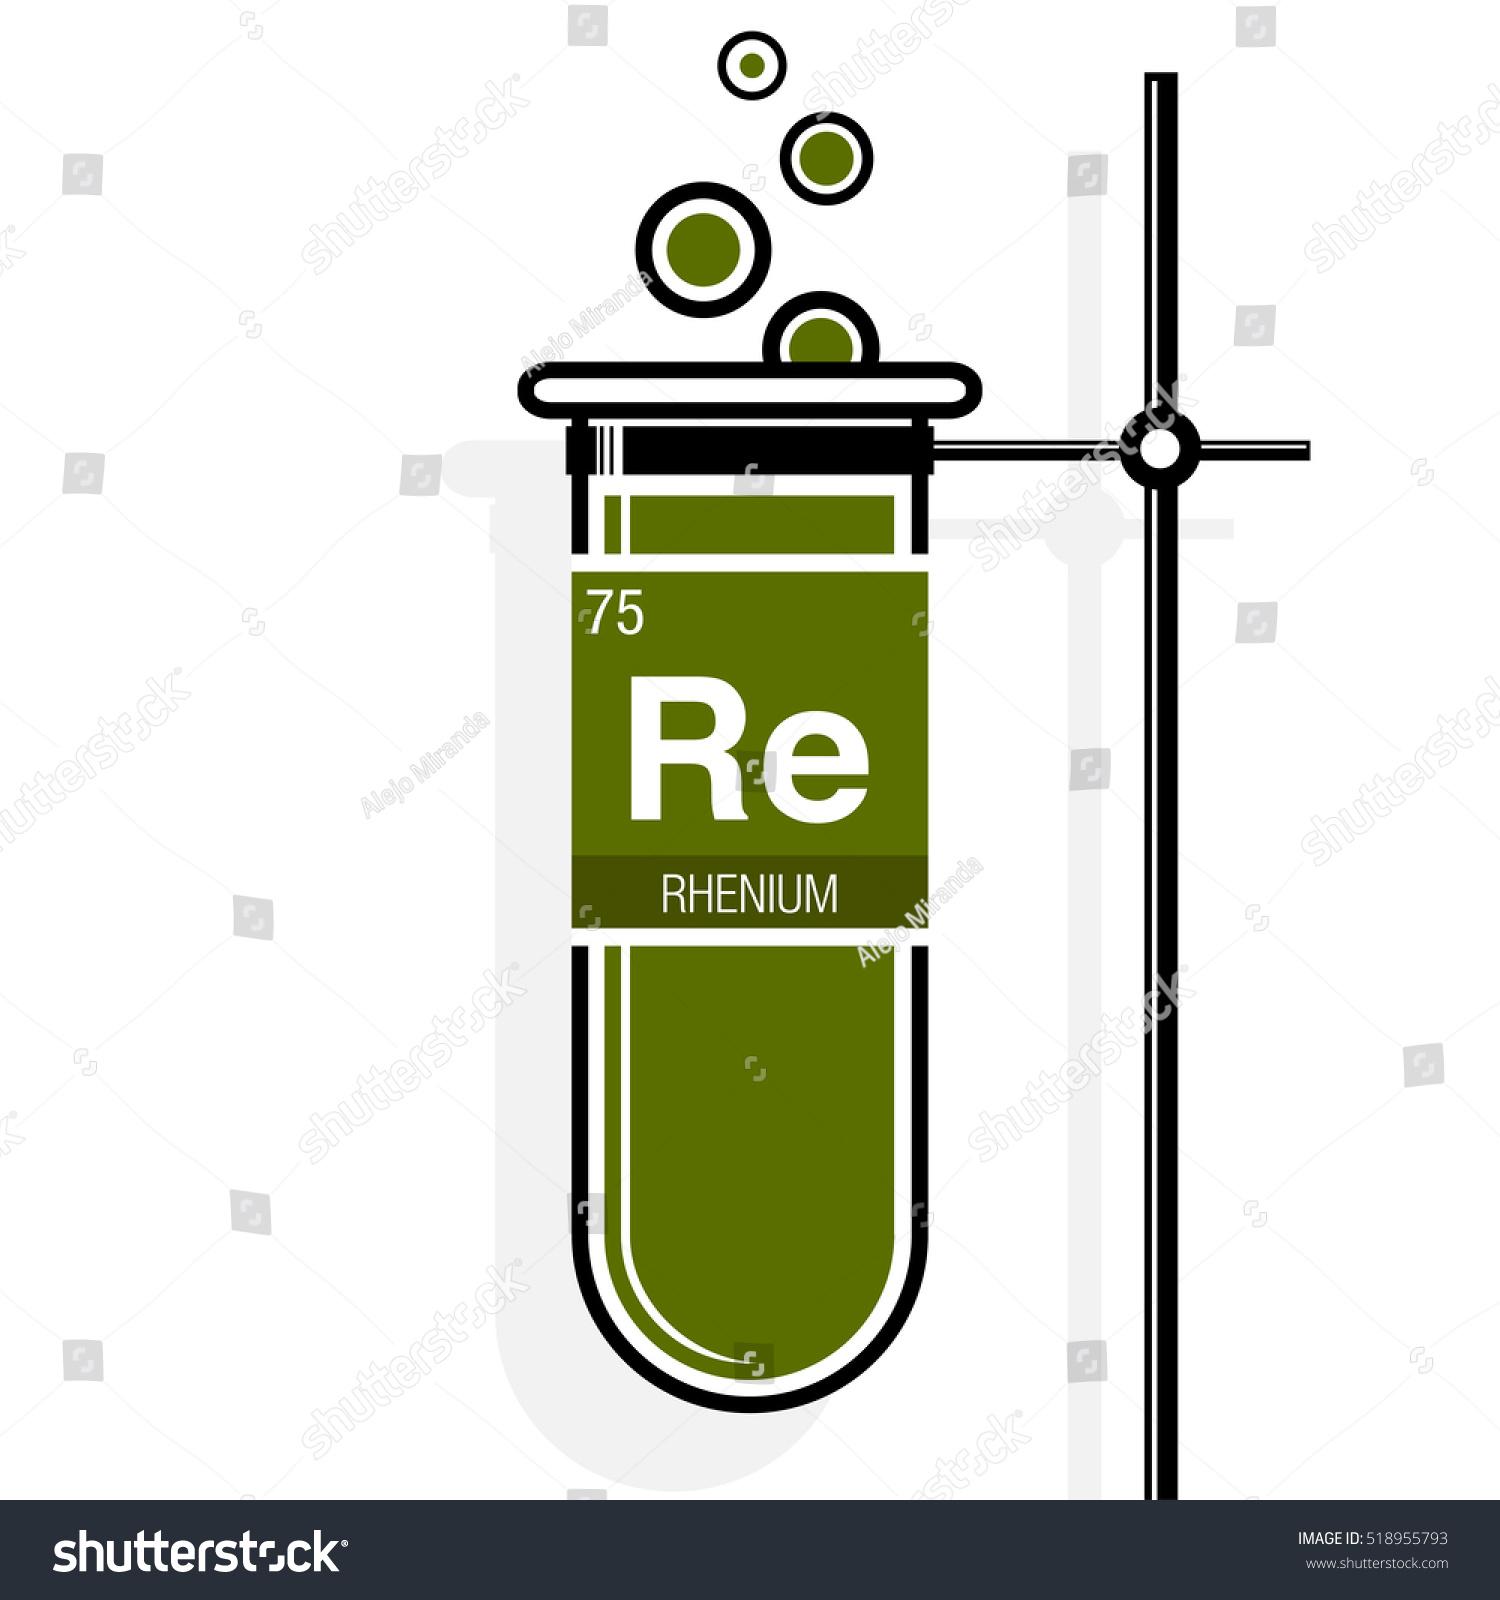 Rhenium symbol on label green test stock vector 518955793 shutterstock rhenium symbol on label in a green test tube with holder element number 75 of urtaz Choice Image